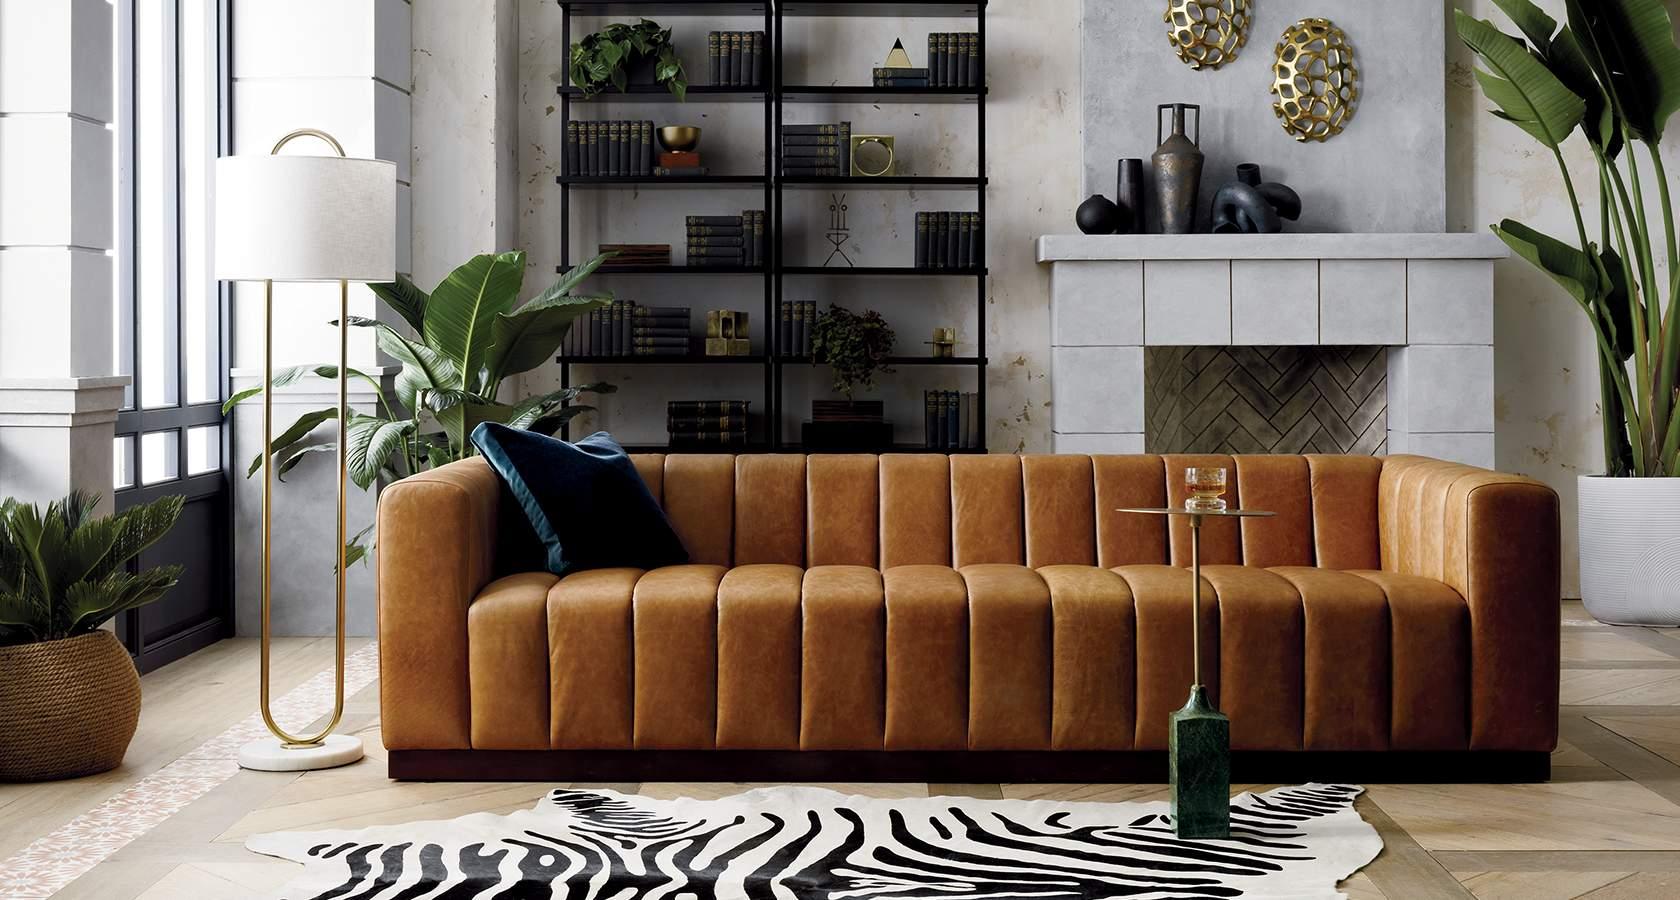 home furniture interior design. statement pieces Modern Furniture and Home Decor  CB2